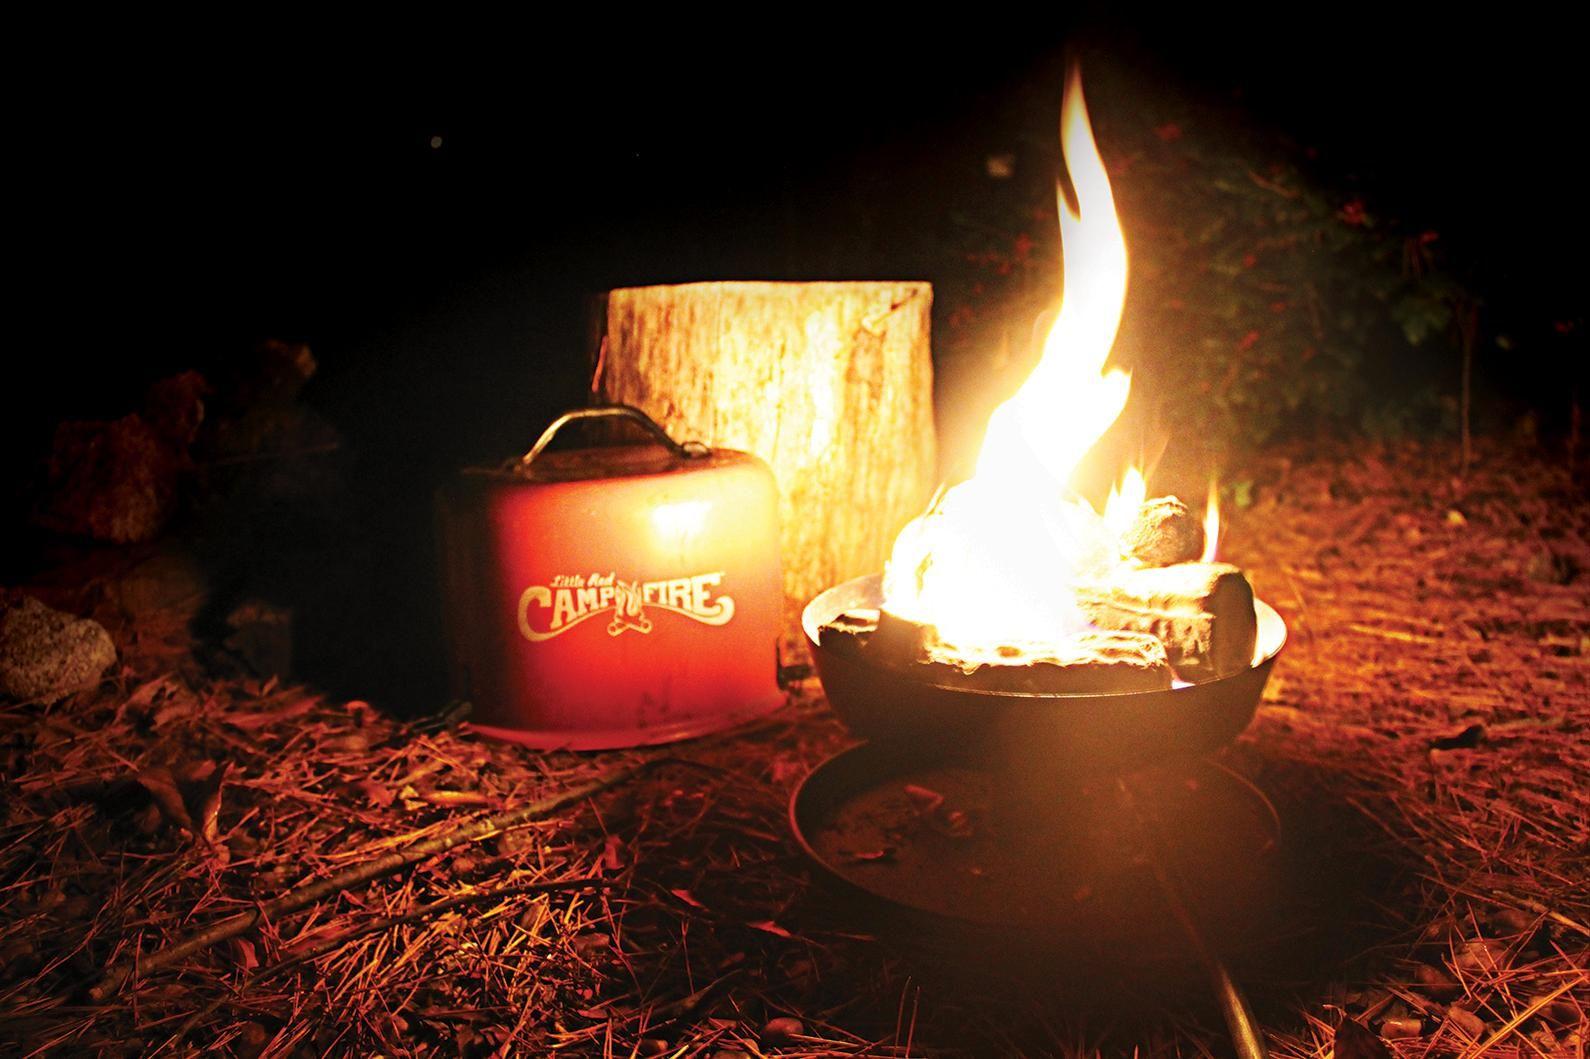 Robot Check Fire Pit Lighting Gazebo With Fire Pit Brick Fire Pit